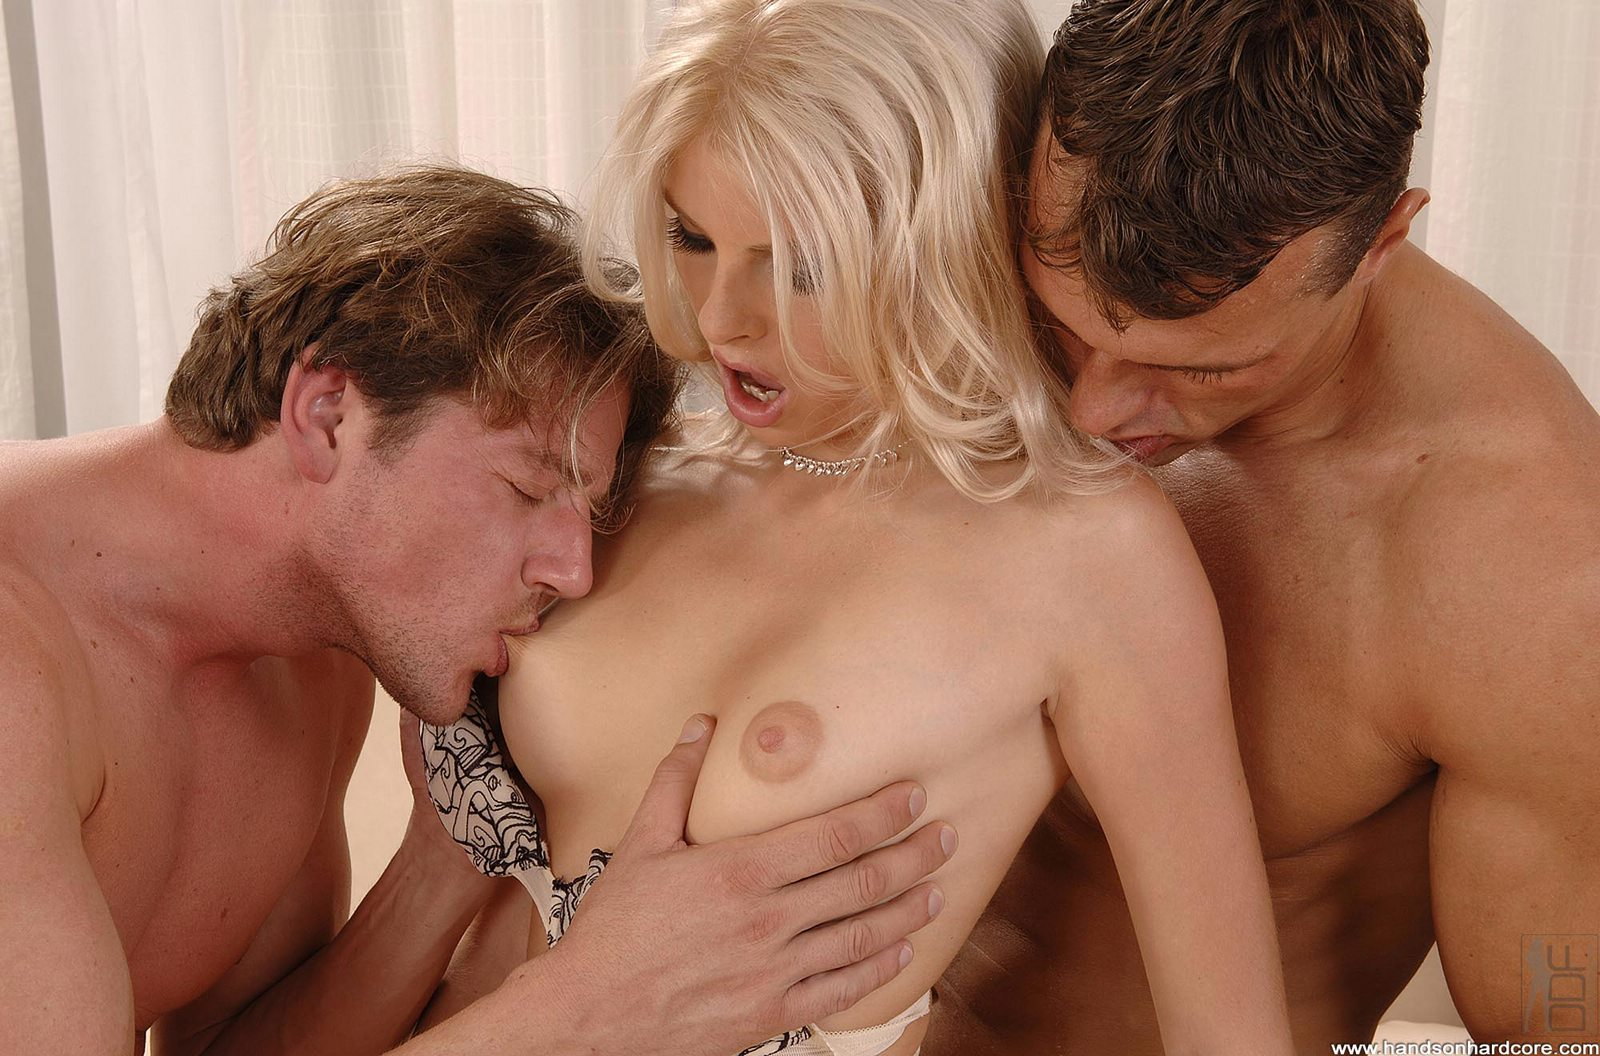 Group sex with three strangers marya 8